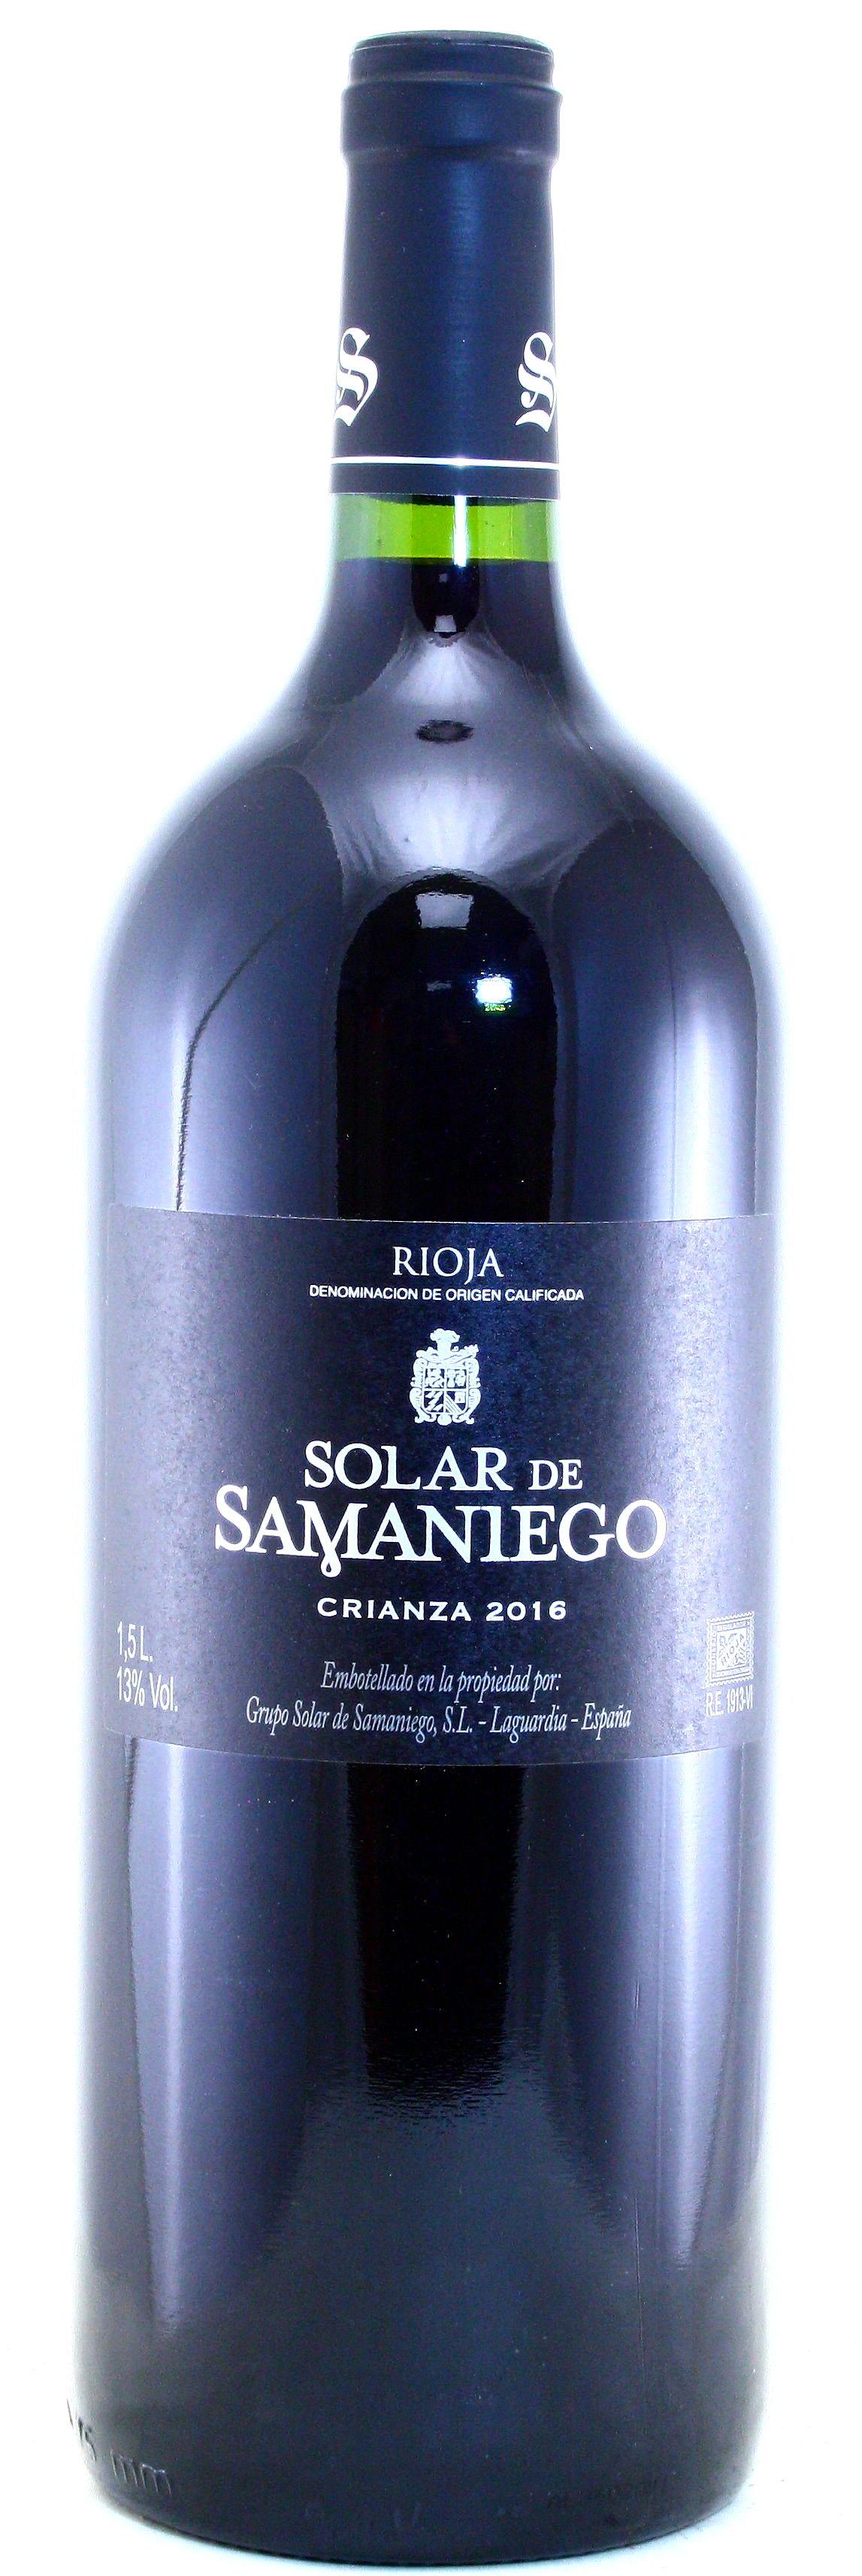 Solar de Samaniego Rioja Crianza - MAGNUM -, Bodegas Alavesas